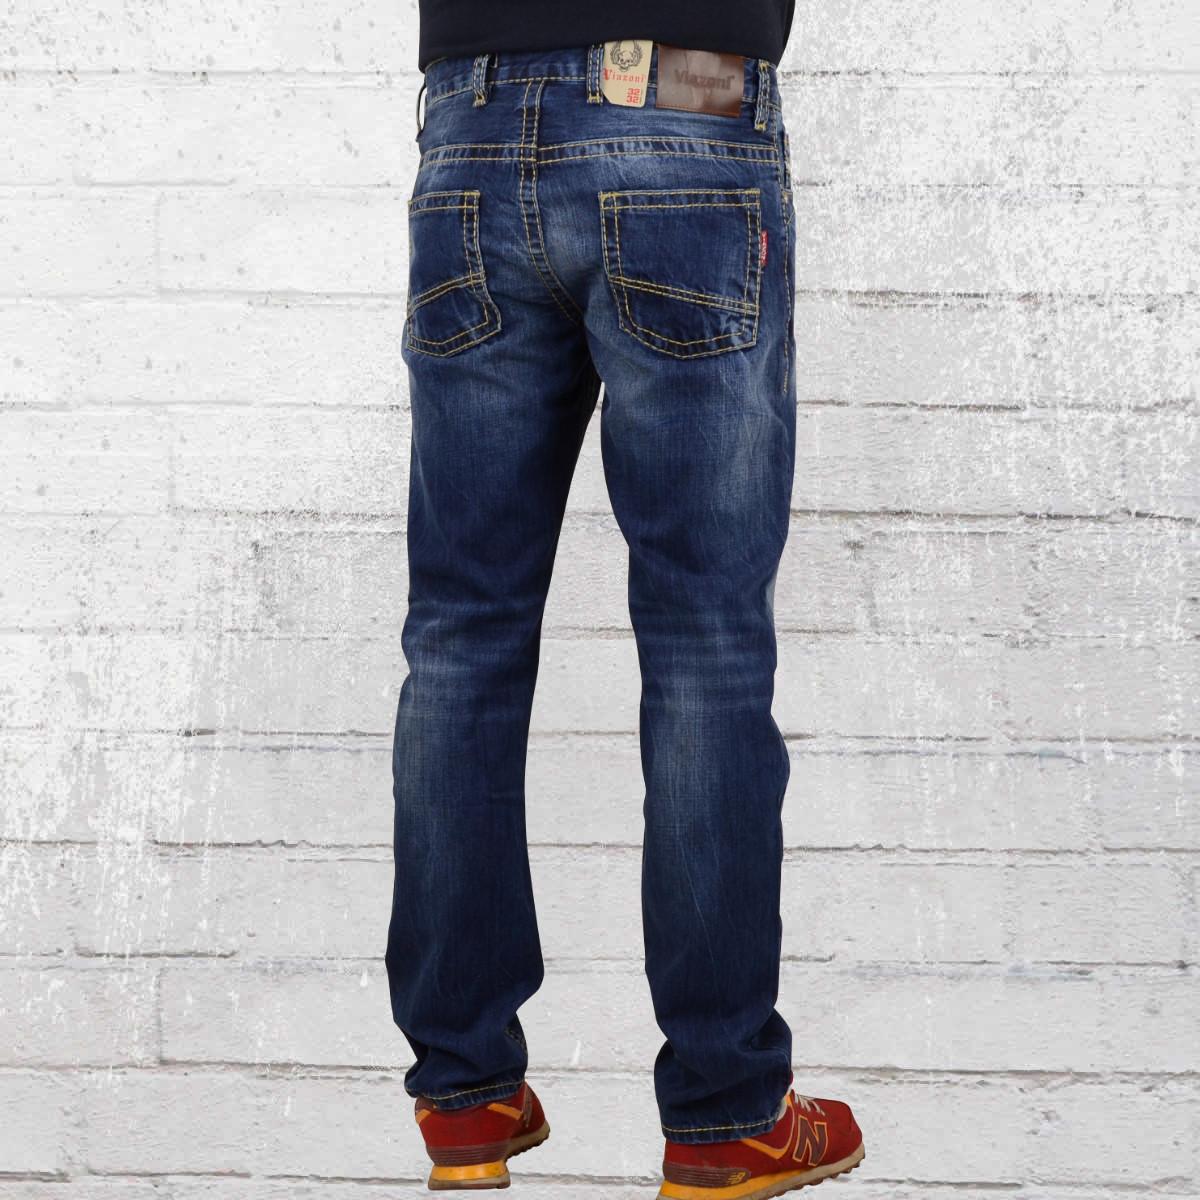 jetzt bestellen viazoni m nner jeanshose nino dunkelblau krasse. Black Bedroom Furniture Sets. Home Design Ideas